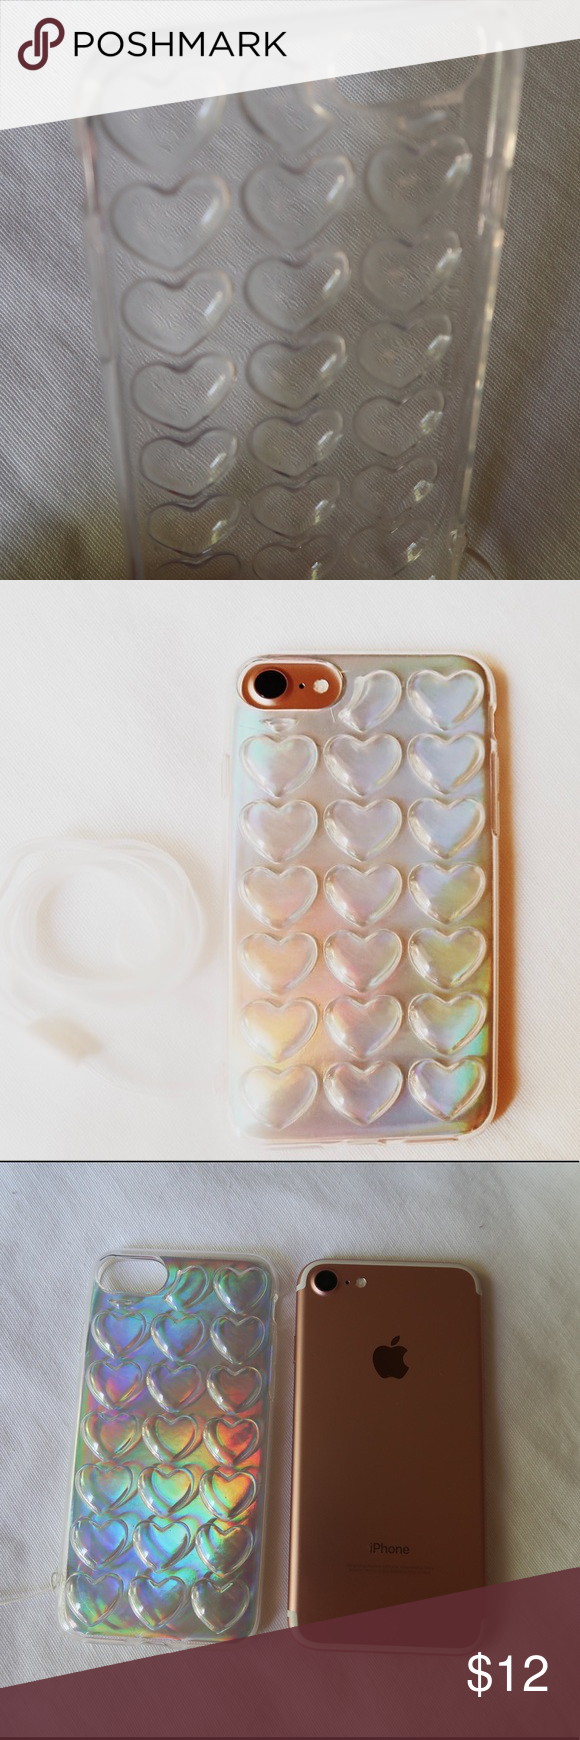 Iphone 7 Unicorn Hologram 3d Heart Case